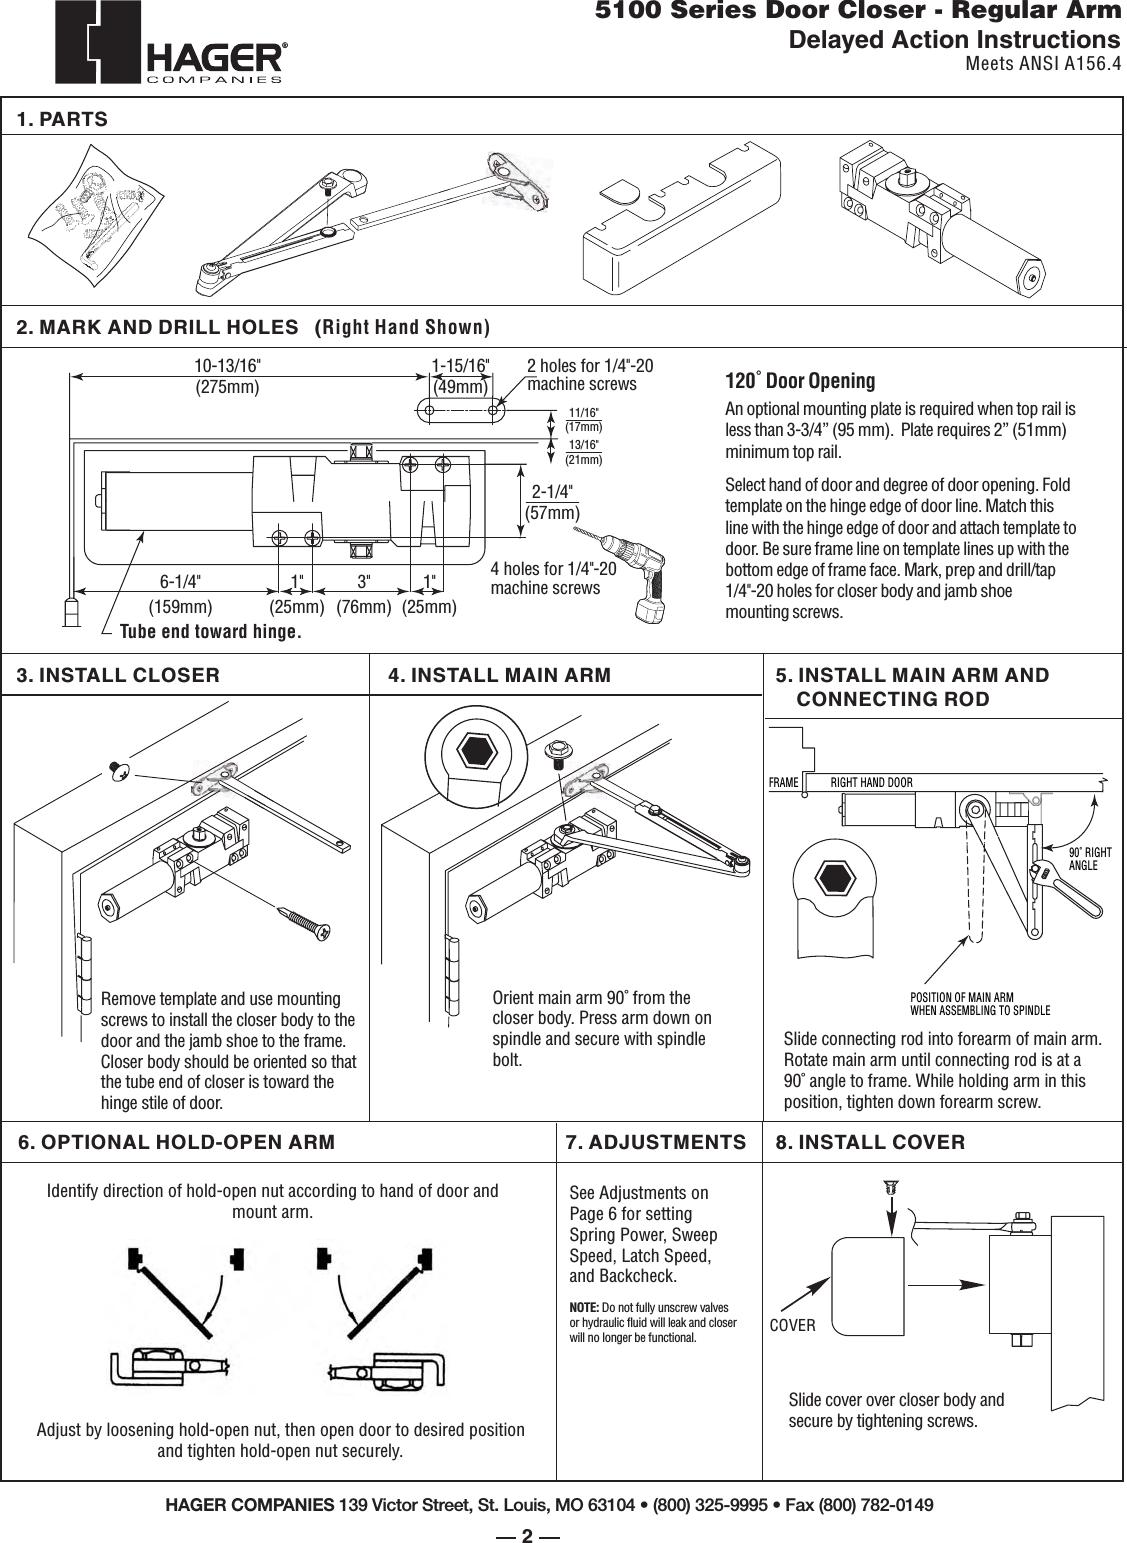 1995 Toyota Supra Wiring Diagram Manual Original For Daihatsu Rocky Kz250 Rh Logoutev De